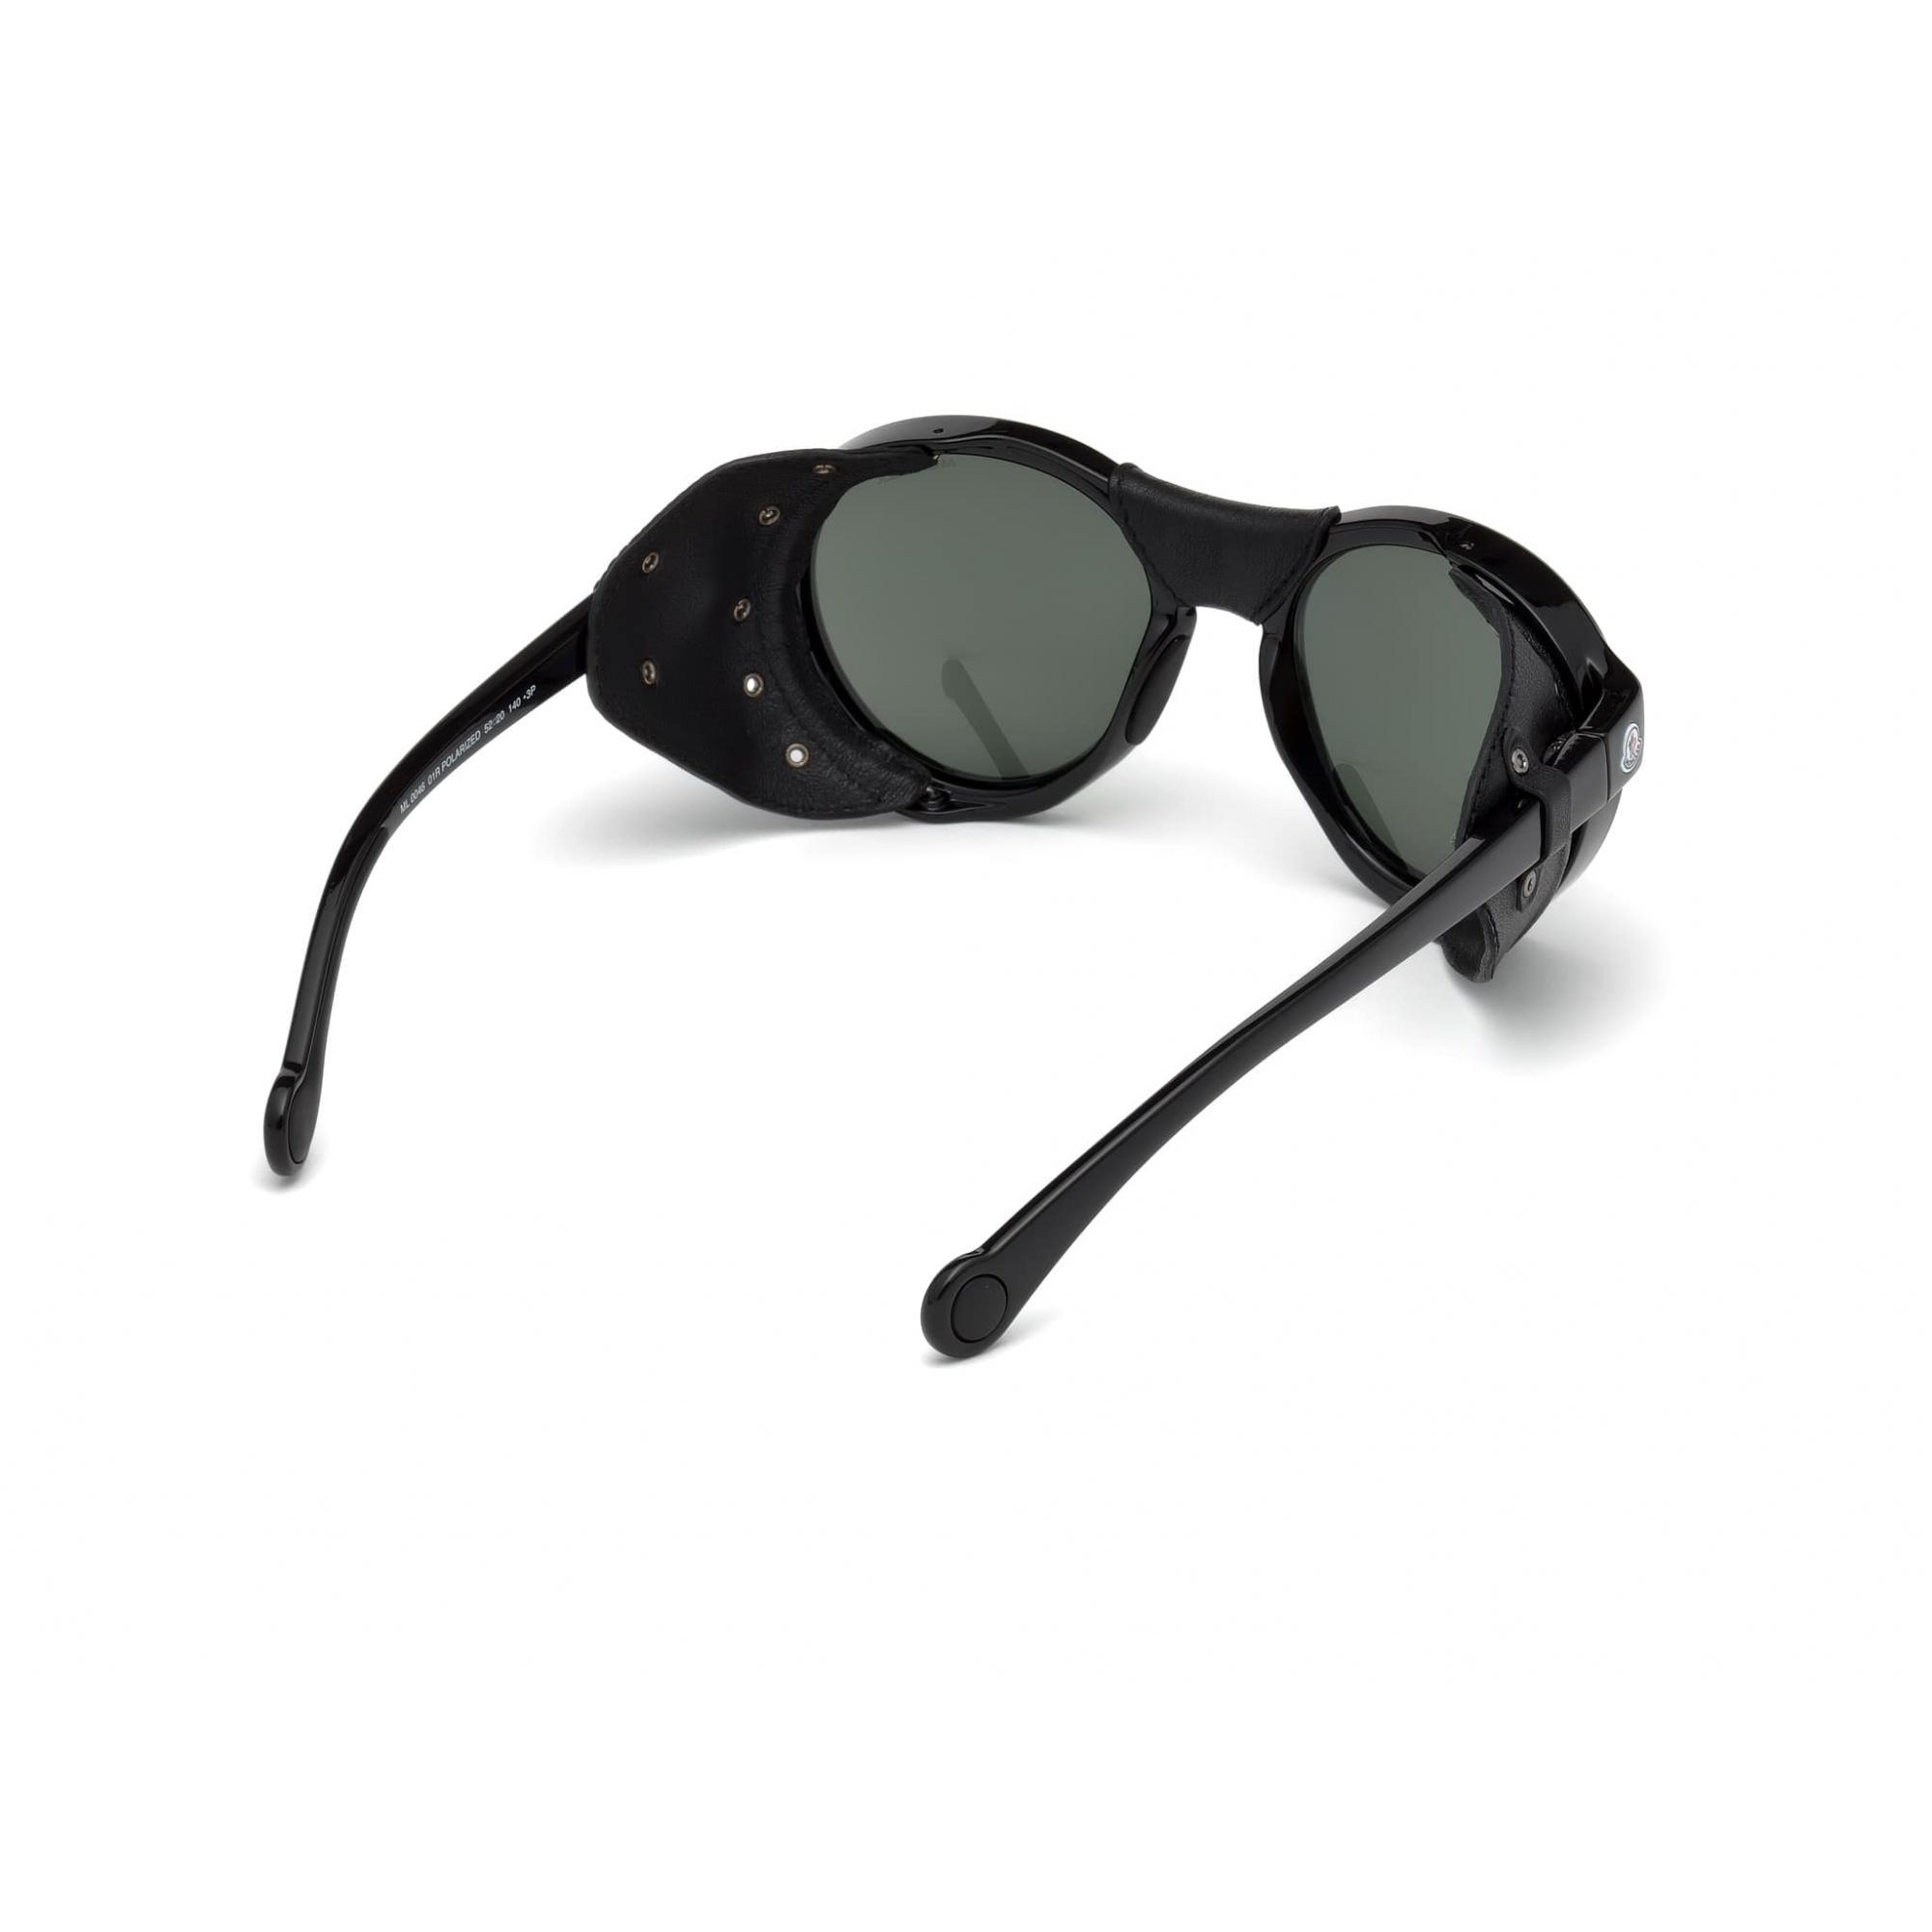 Moncler ML0046 - 01R 52